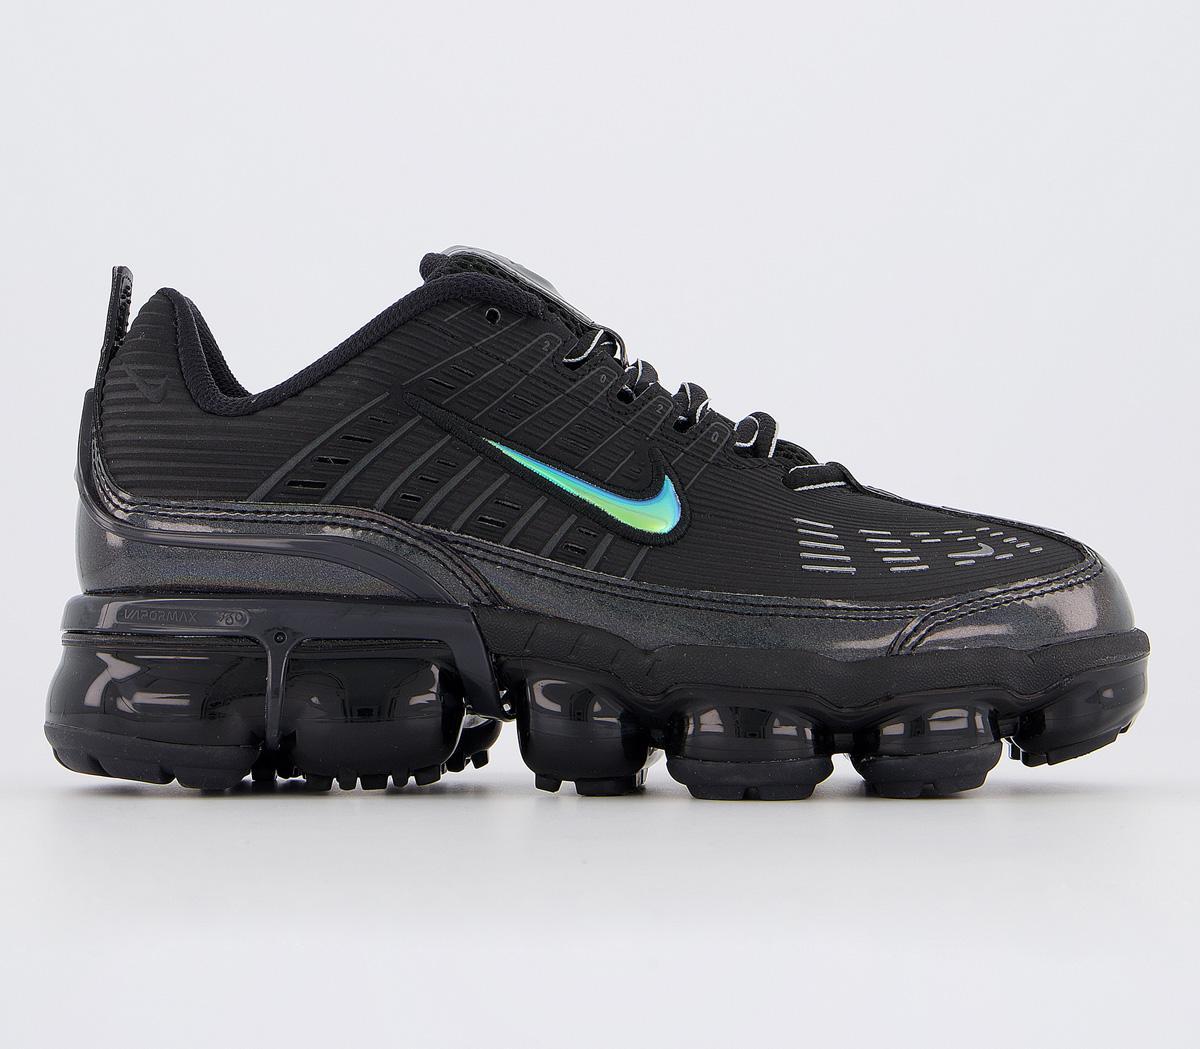 Nike Air Vapormax 360 Trainers Black